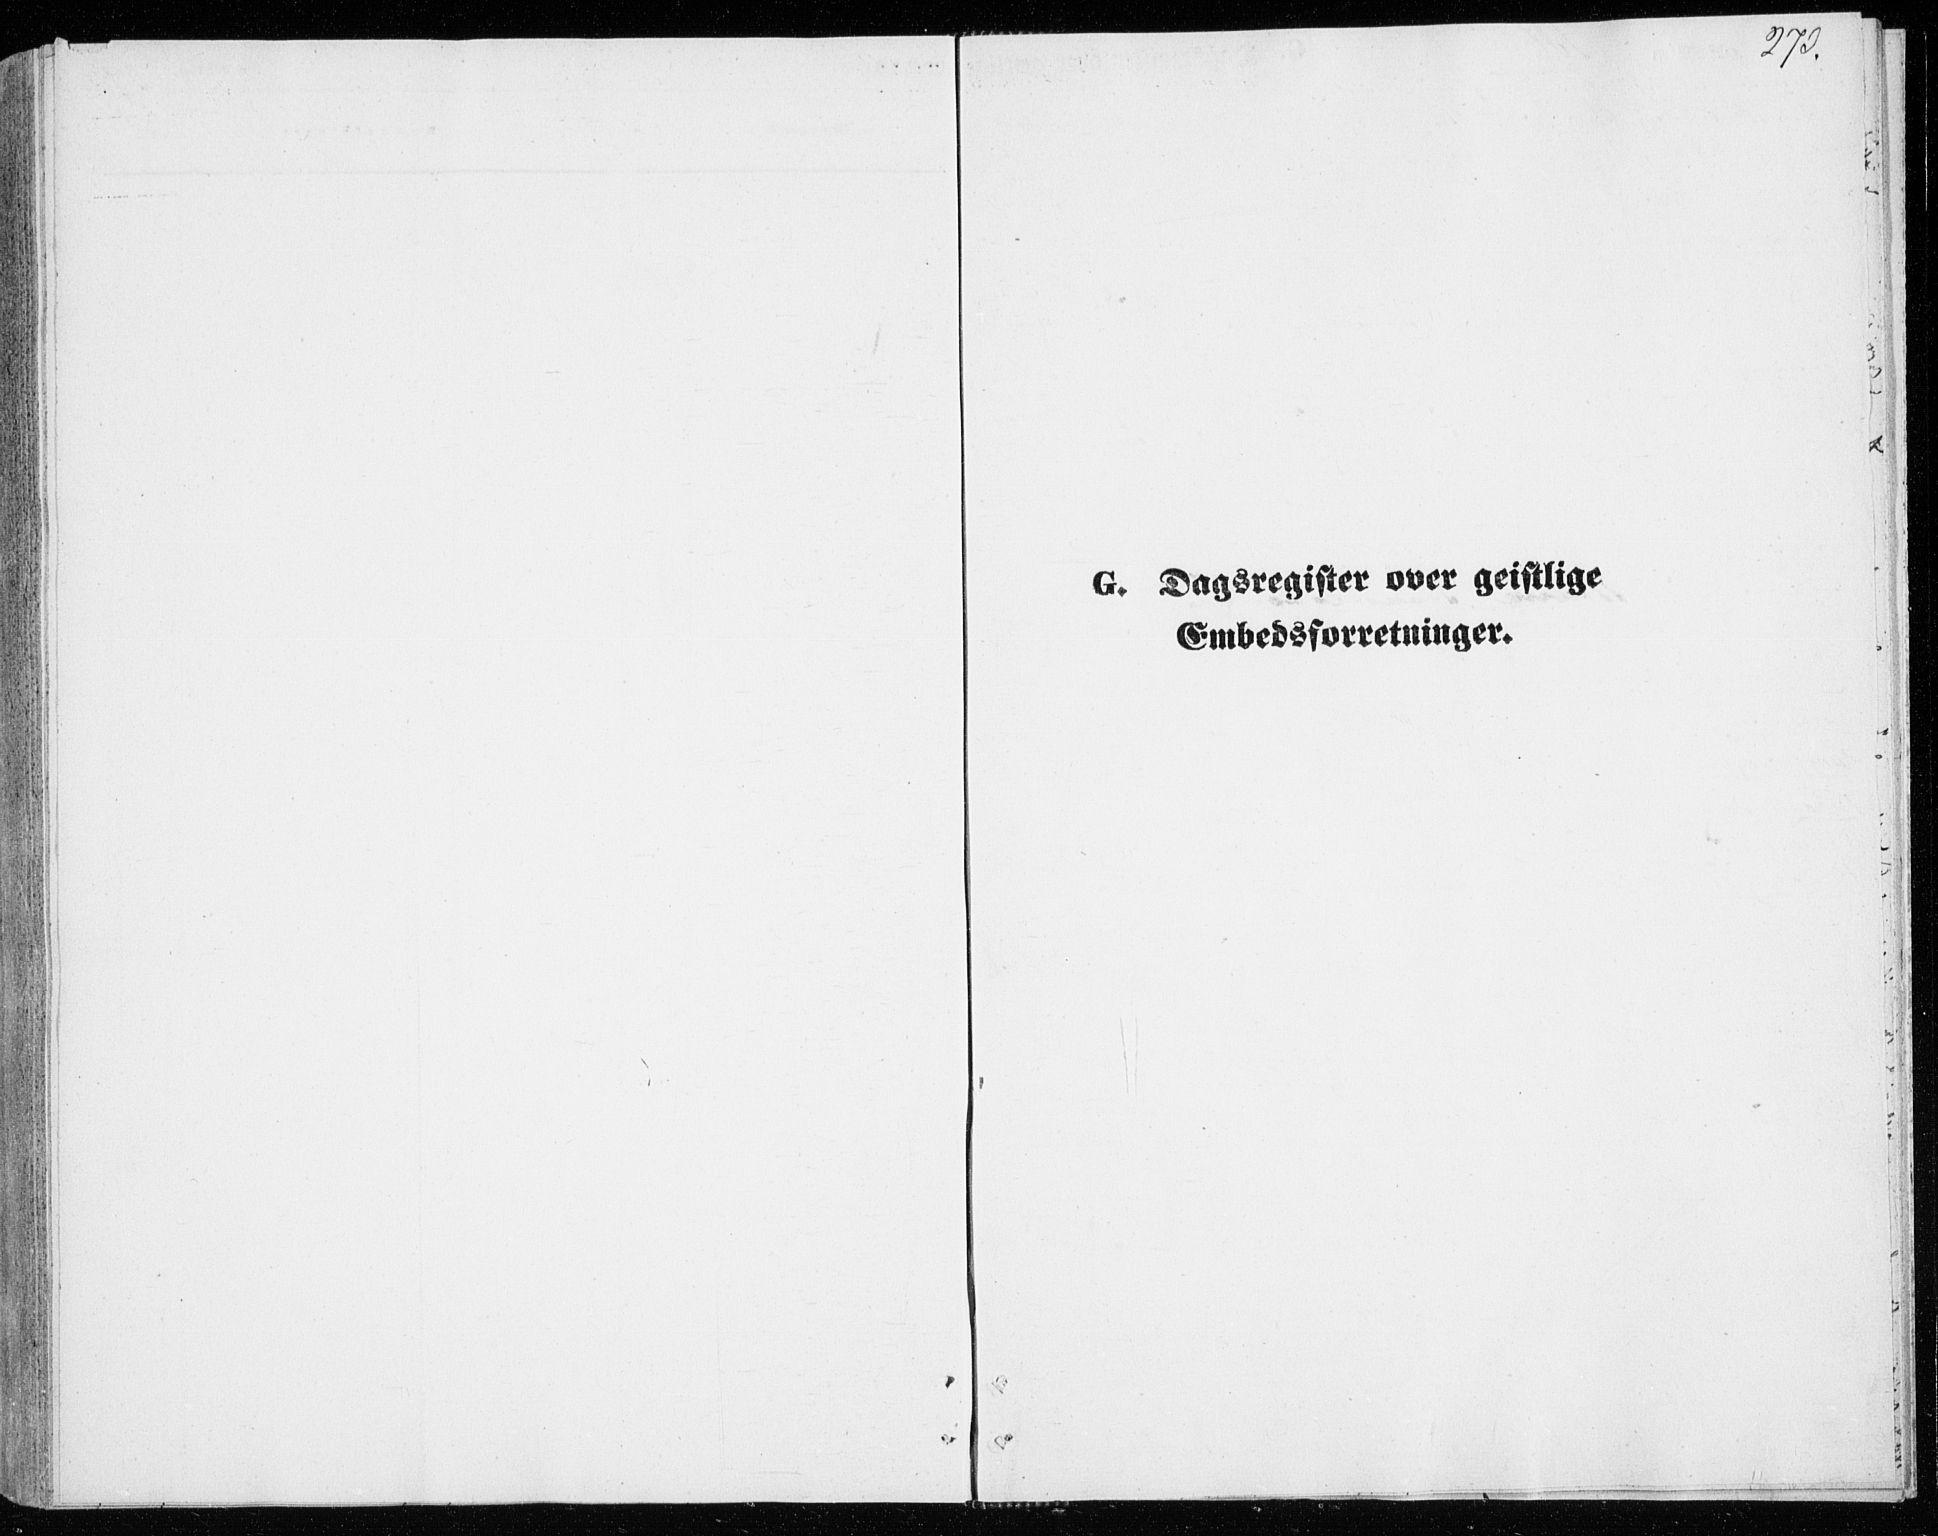 SATØ, Lenvik sokneprestembete, H/Ha: Ministerialbok nr. 9, 1866-1873, s. 273